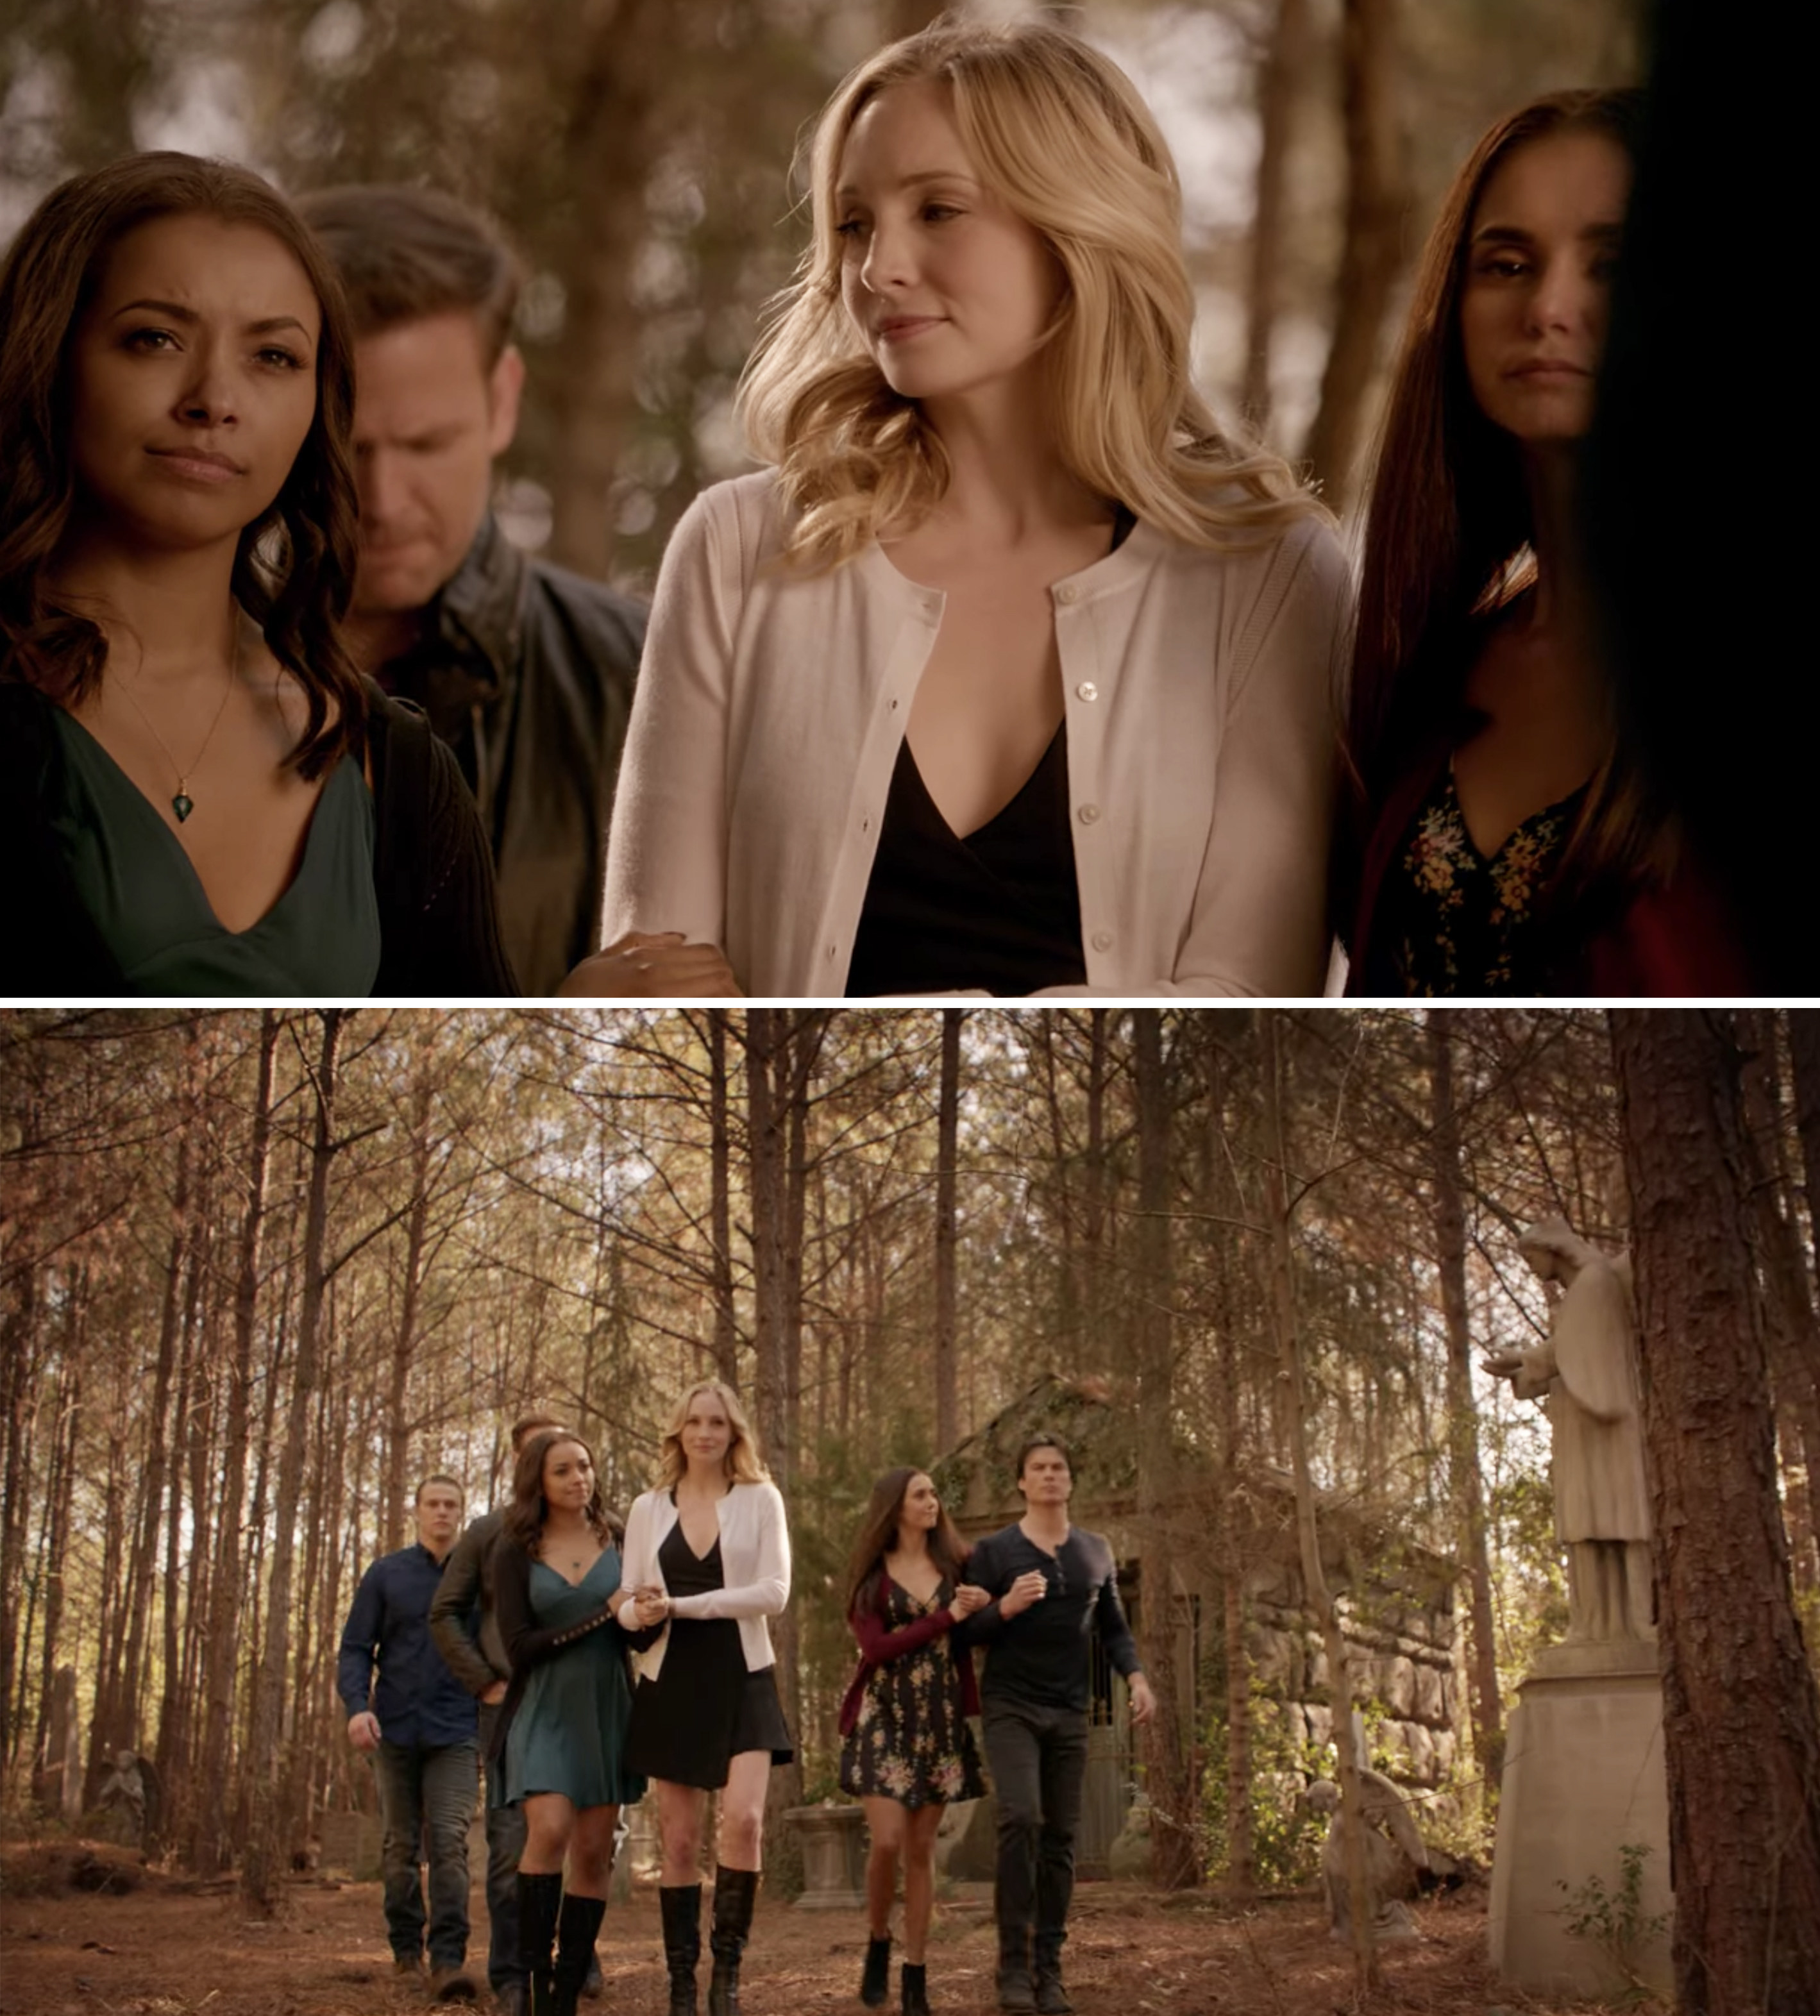 Caroline, Bonnie, Elena, Damon, Matt, and Alaric visiting Stefan's grave during the series finale